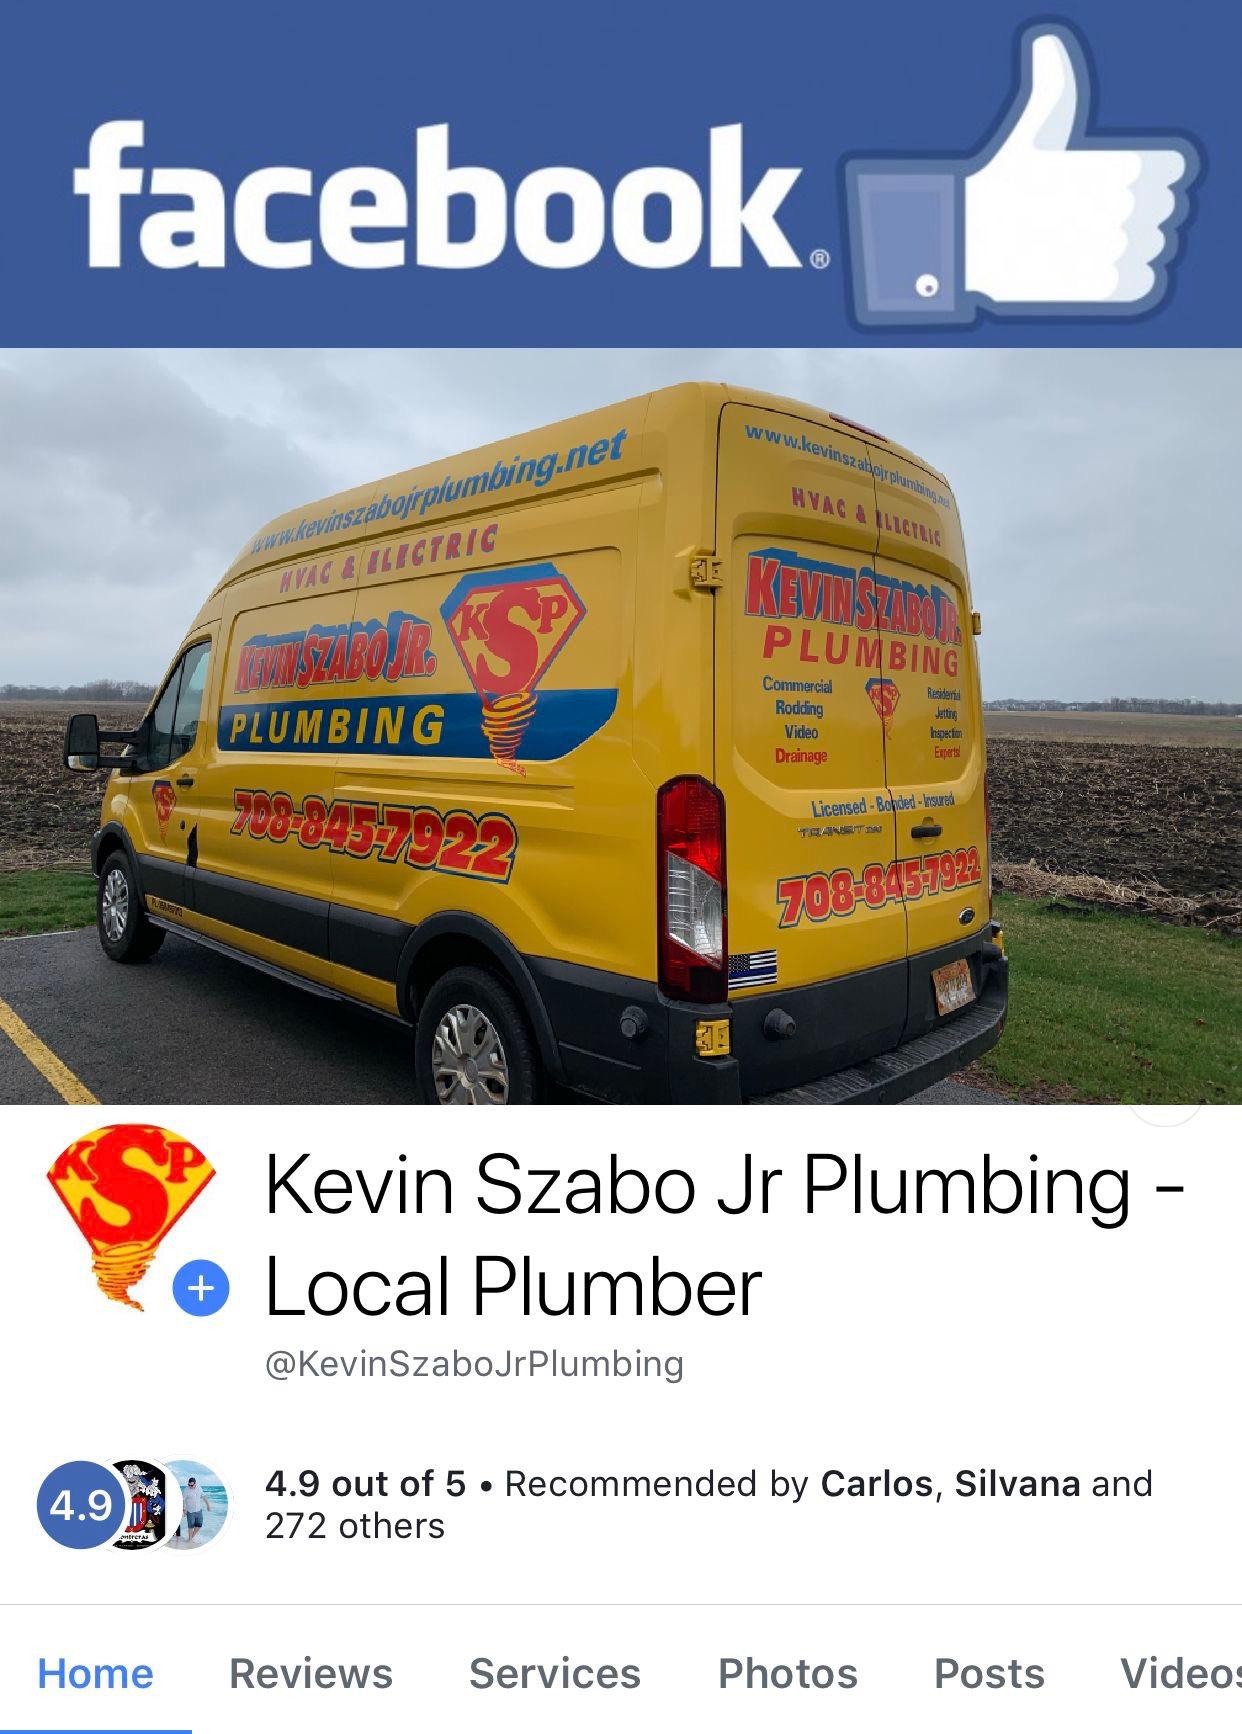 Kevin Szabo Jr Plumbing Facebook Plugin Spring 2019.JPG